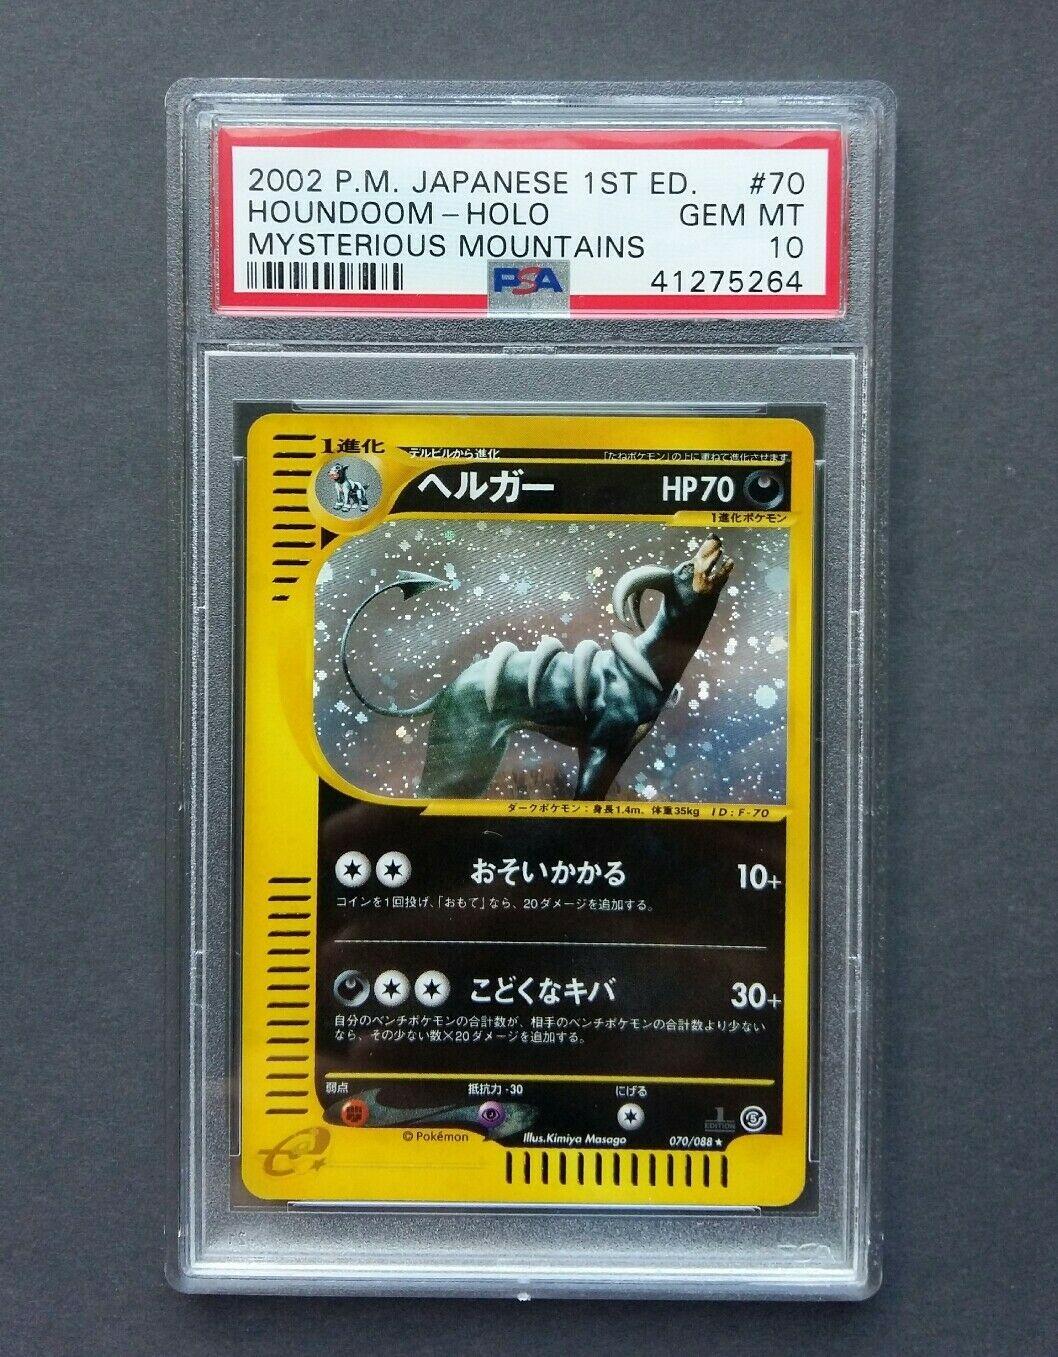 PSA 10 Houndoom Mysterious mountains Holo 070088 Pokemon Card JAP